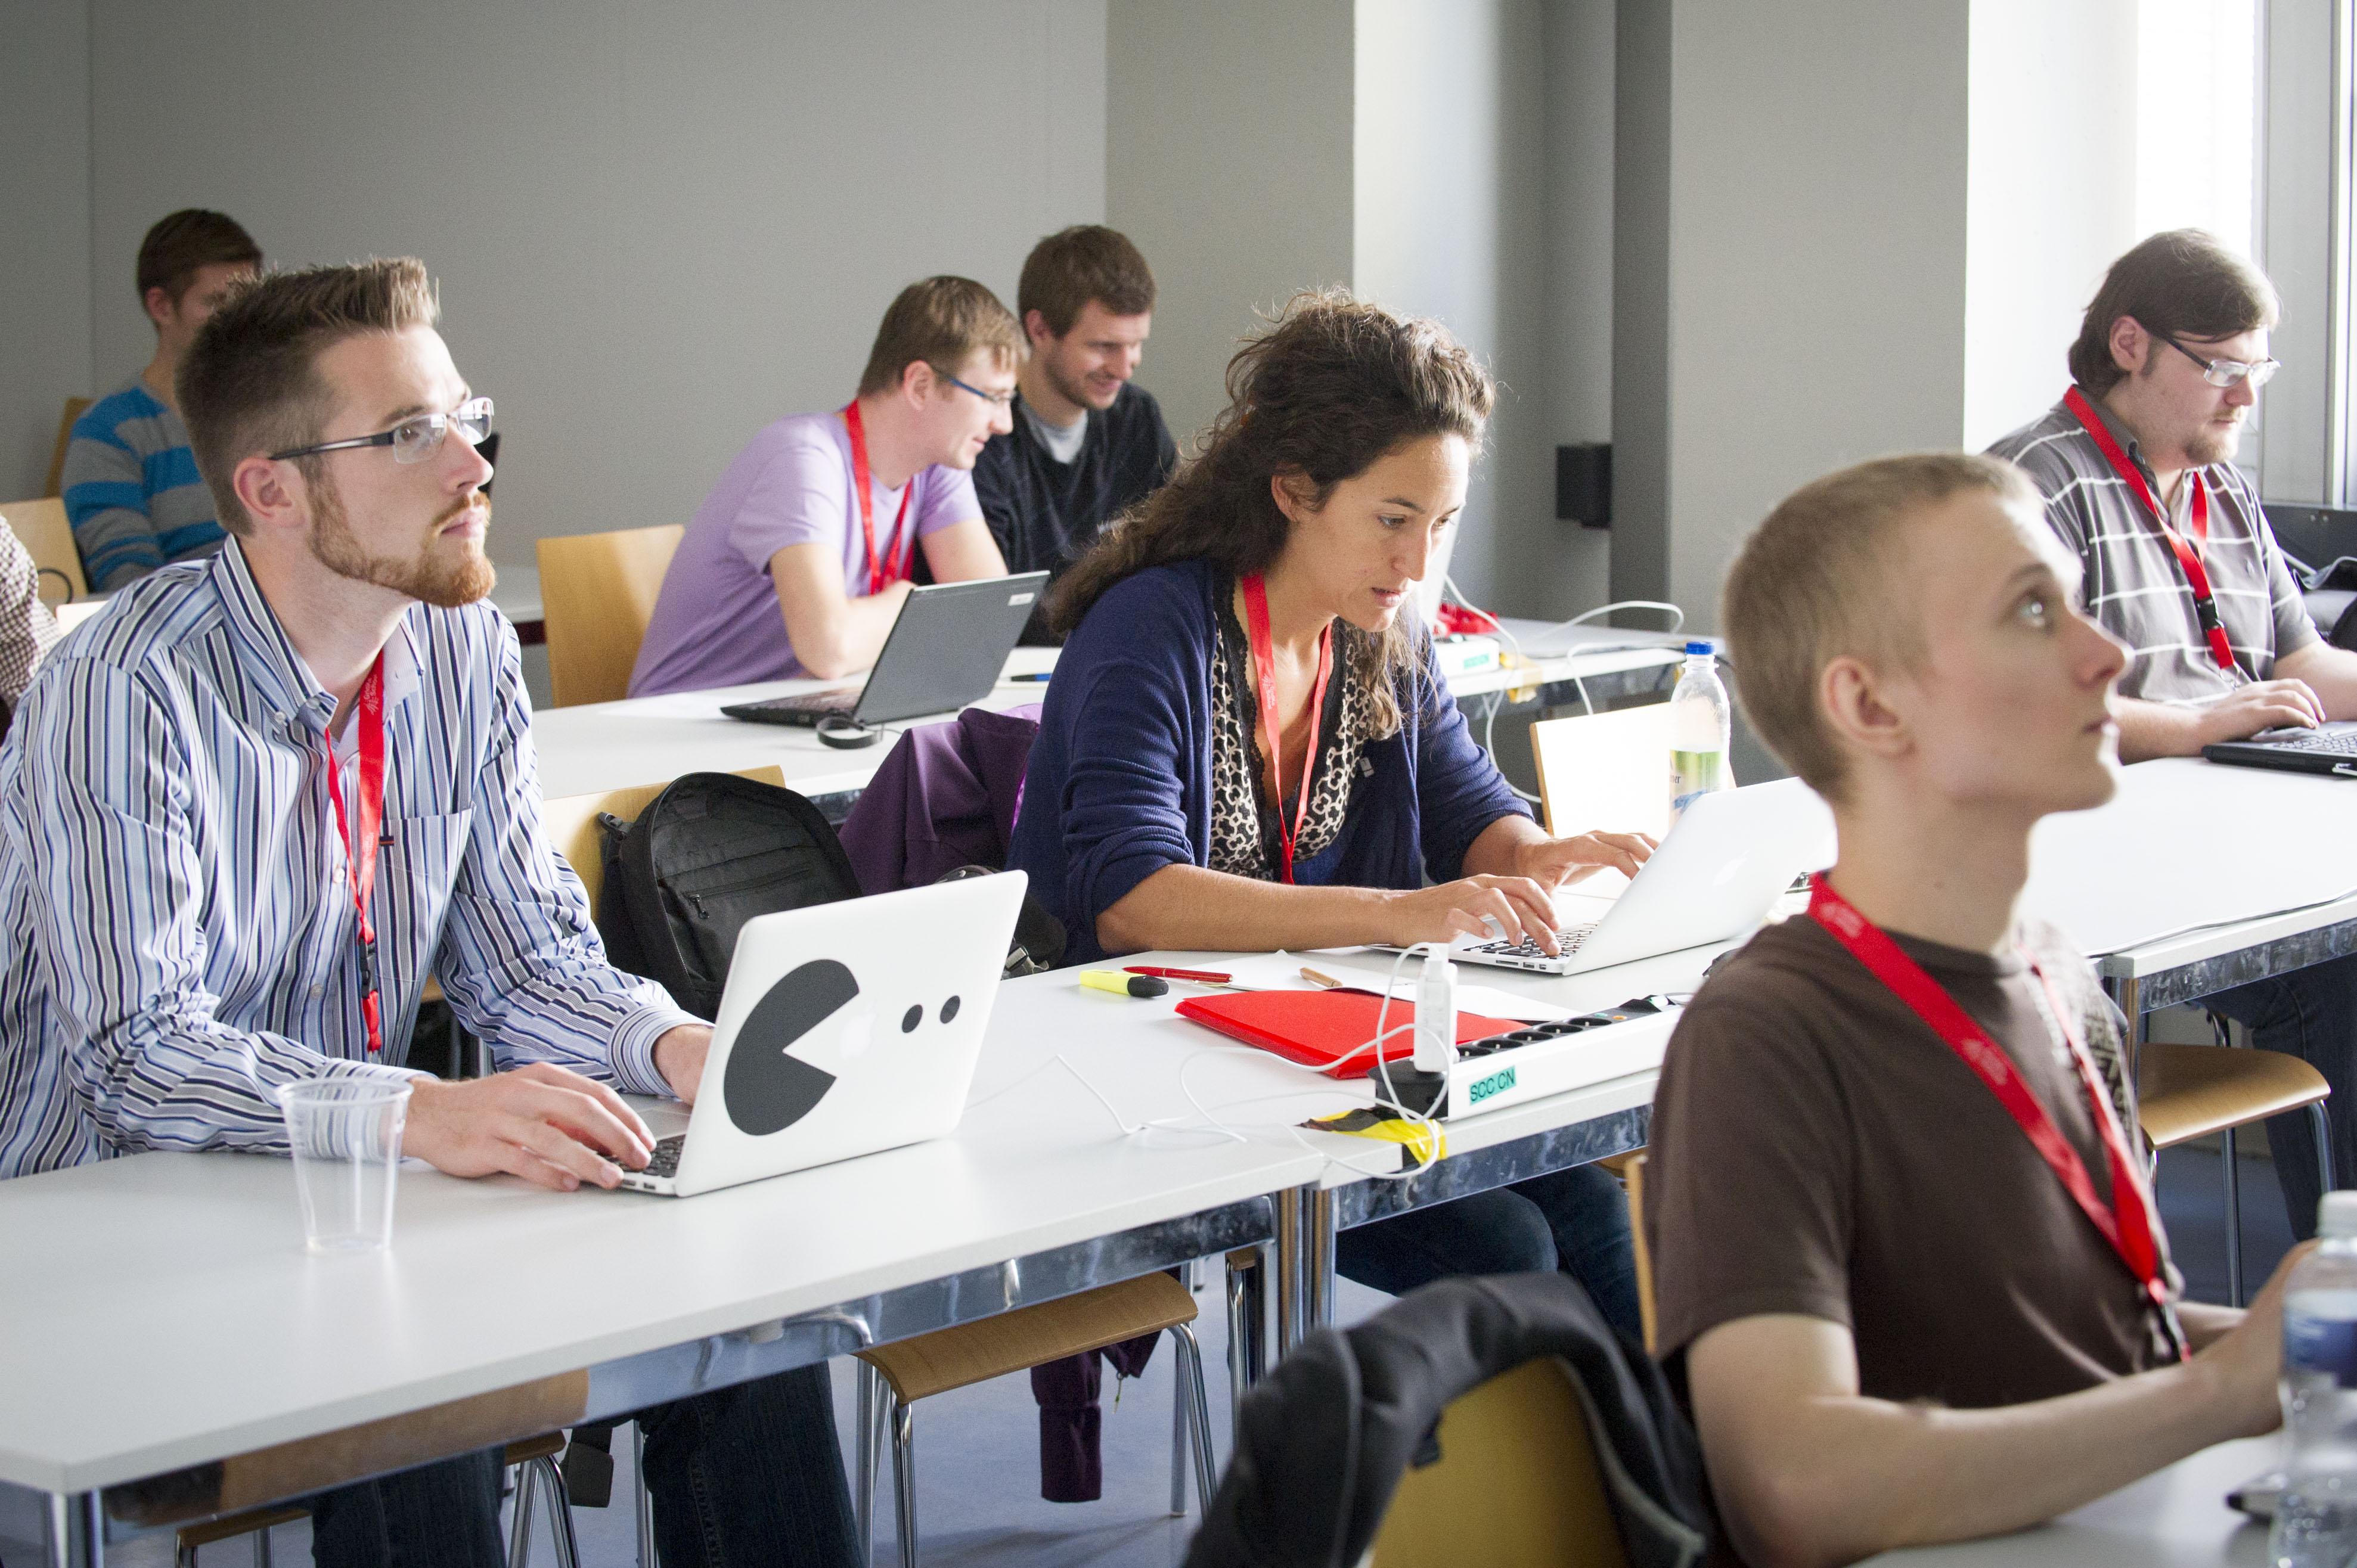 attentive at GridKa School 2015 (photo by Tanja Meissner, KIT)